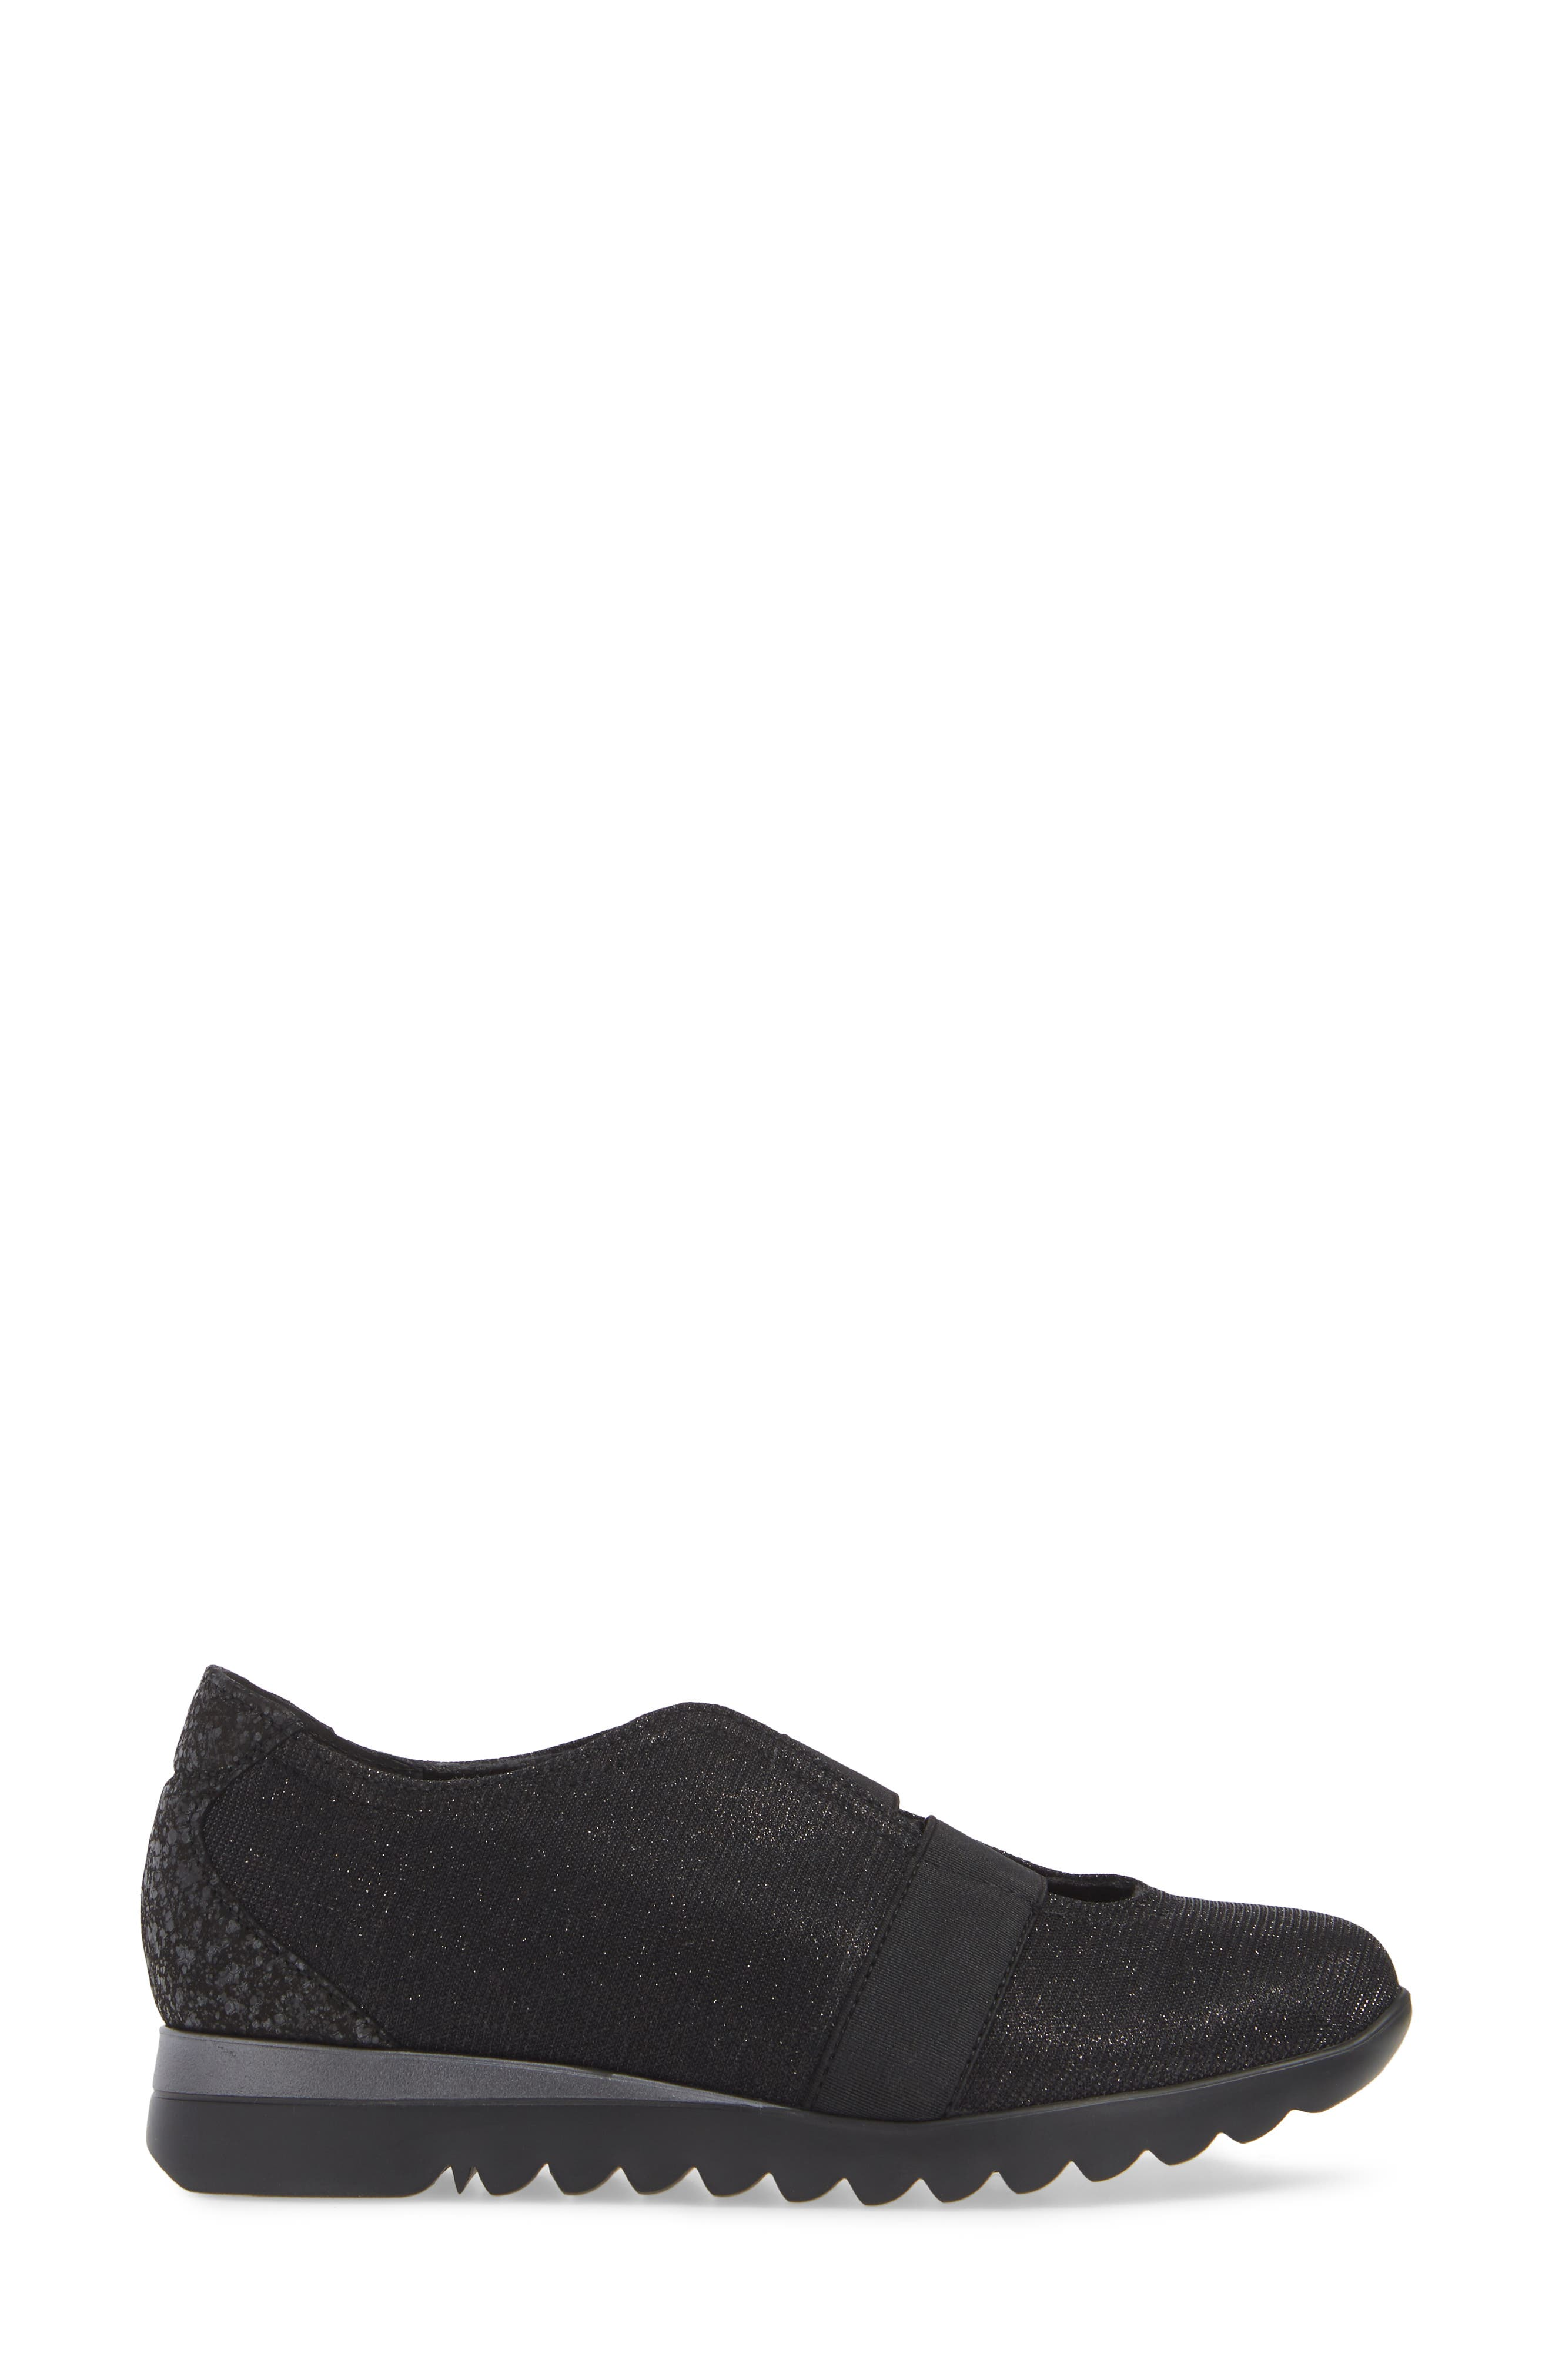 MUNRO, Alta Slip-On Sneaker, Alternate thumbnail 3, color, BLACK SPARKLE FABRIC